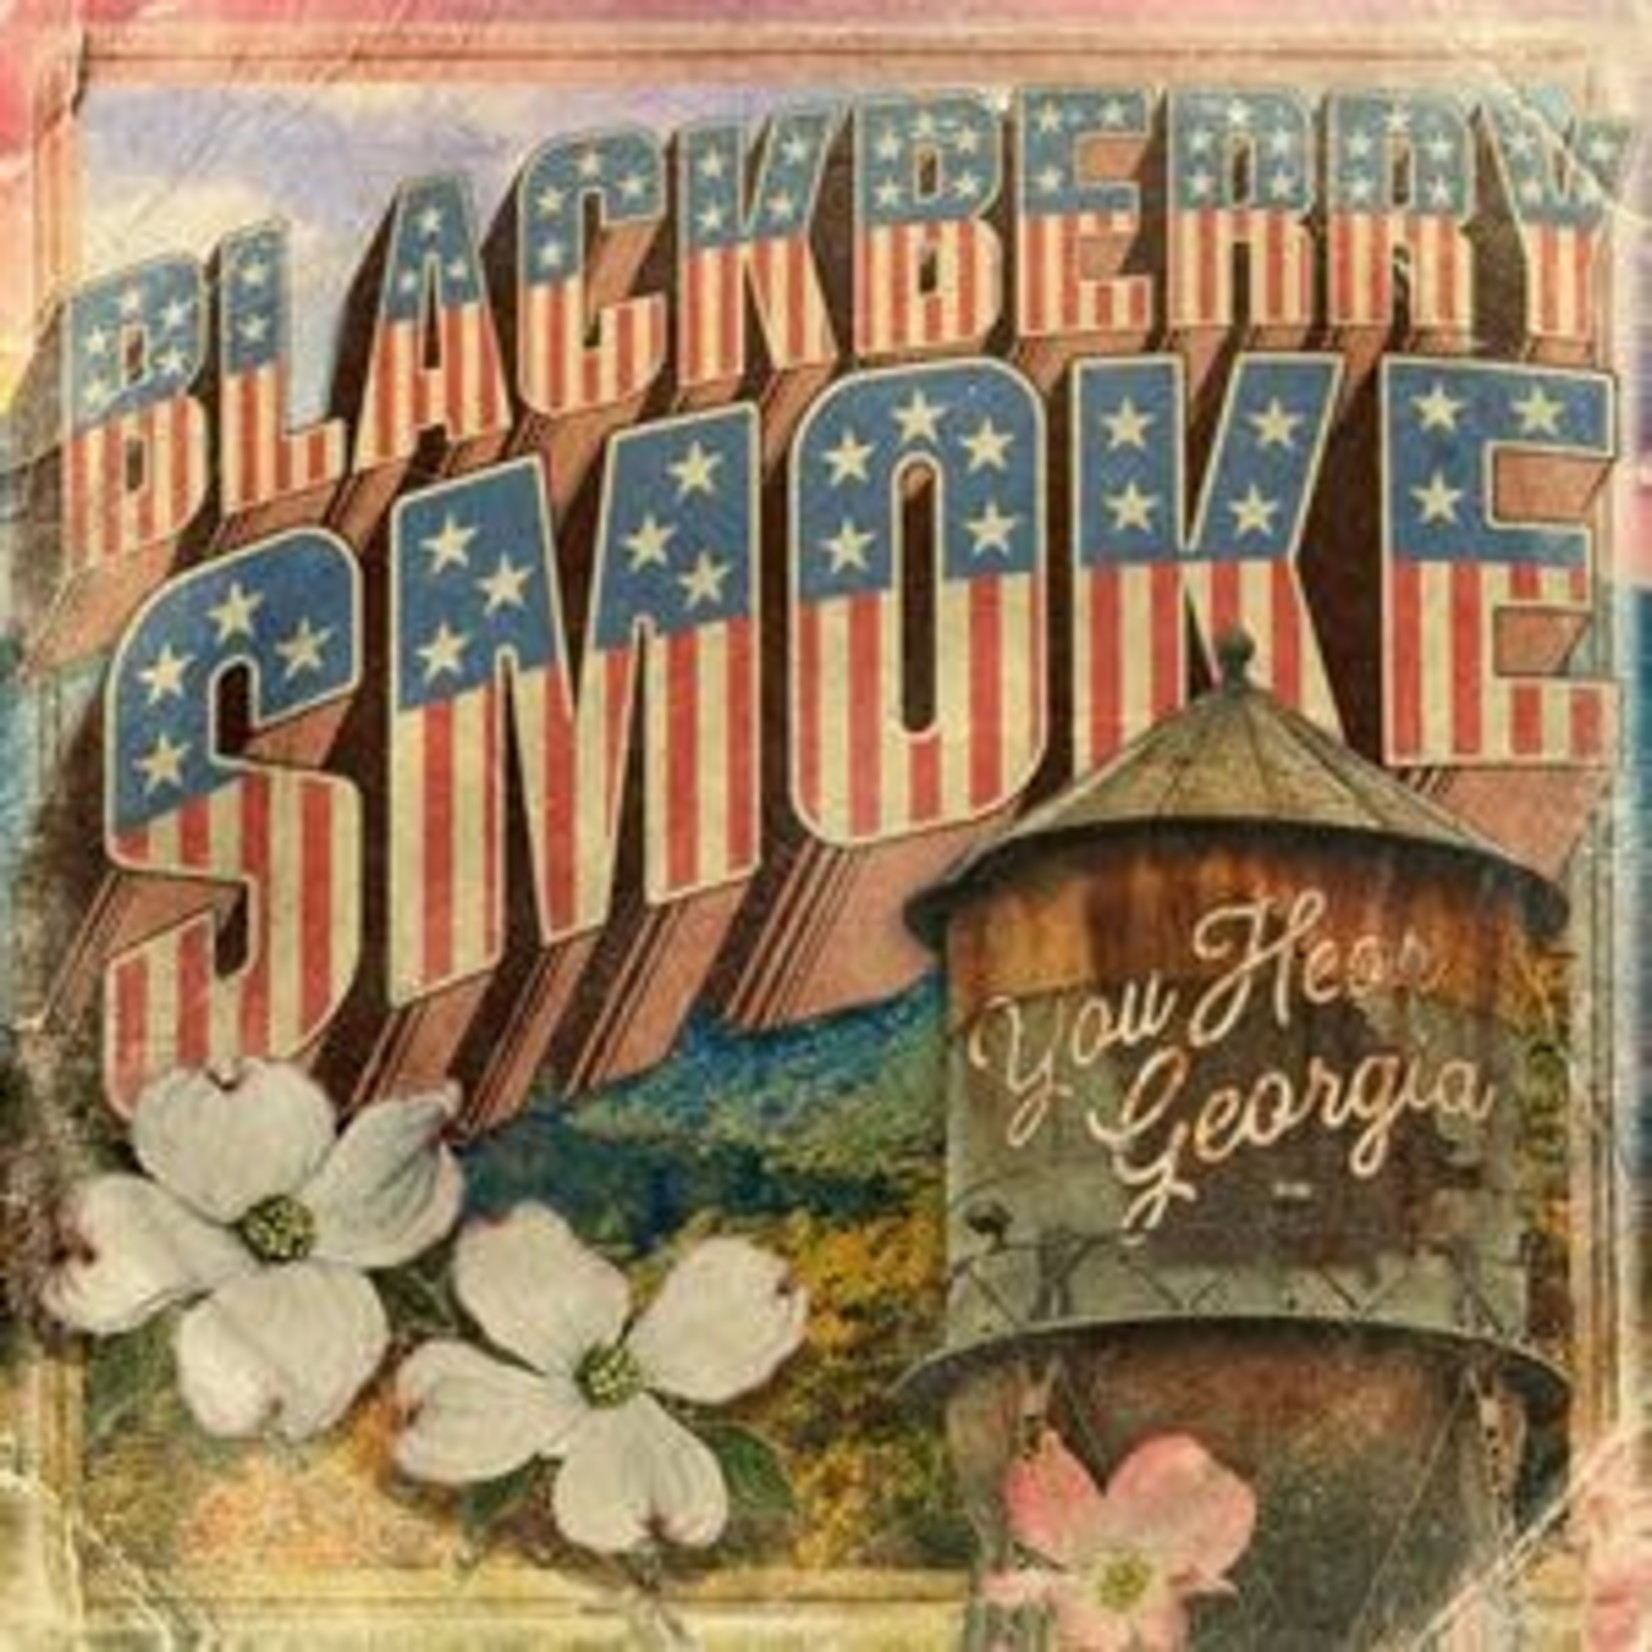 BLACKBERRY SMOKE - YOU HEAR GEORGIA -INDIE- (VINYL)